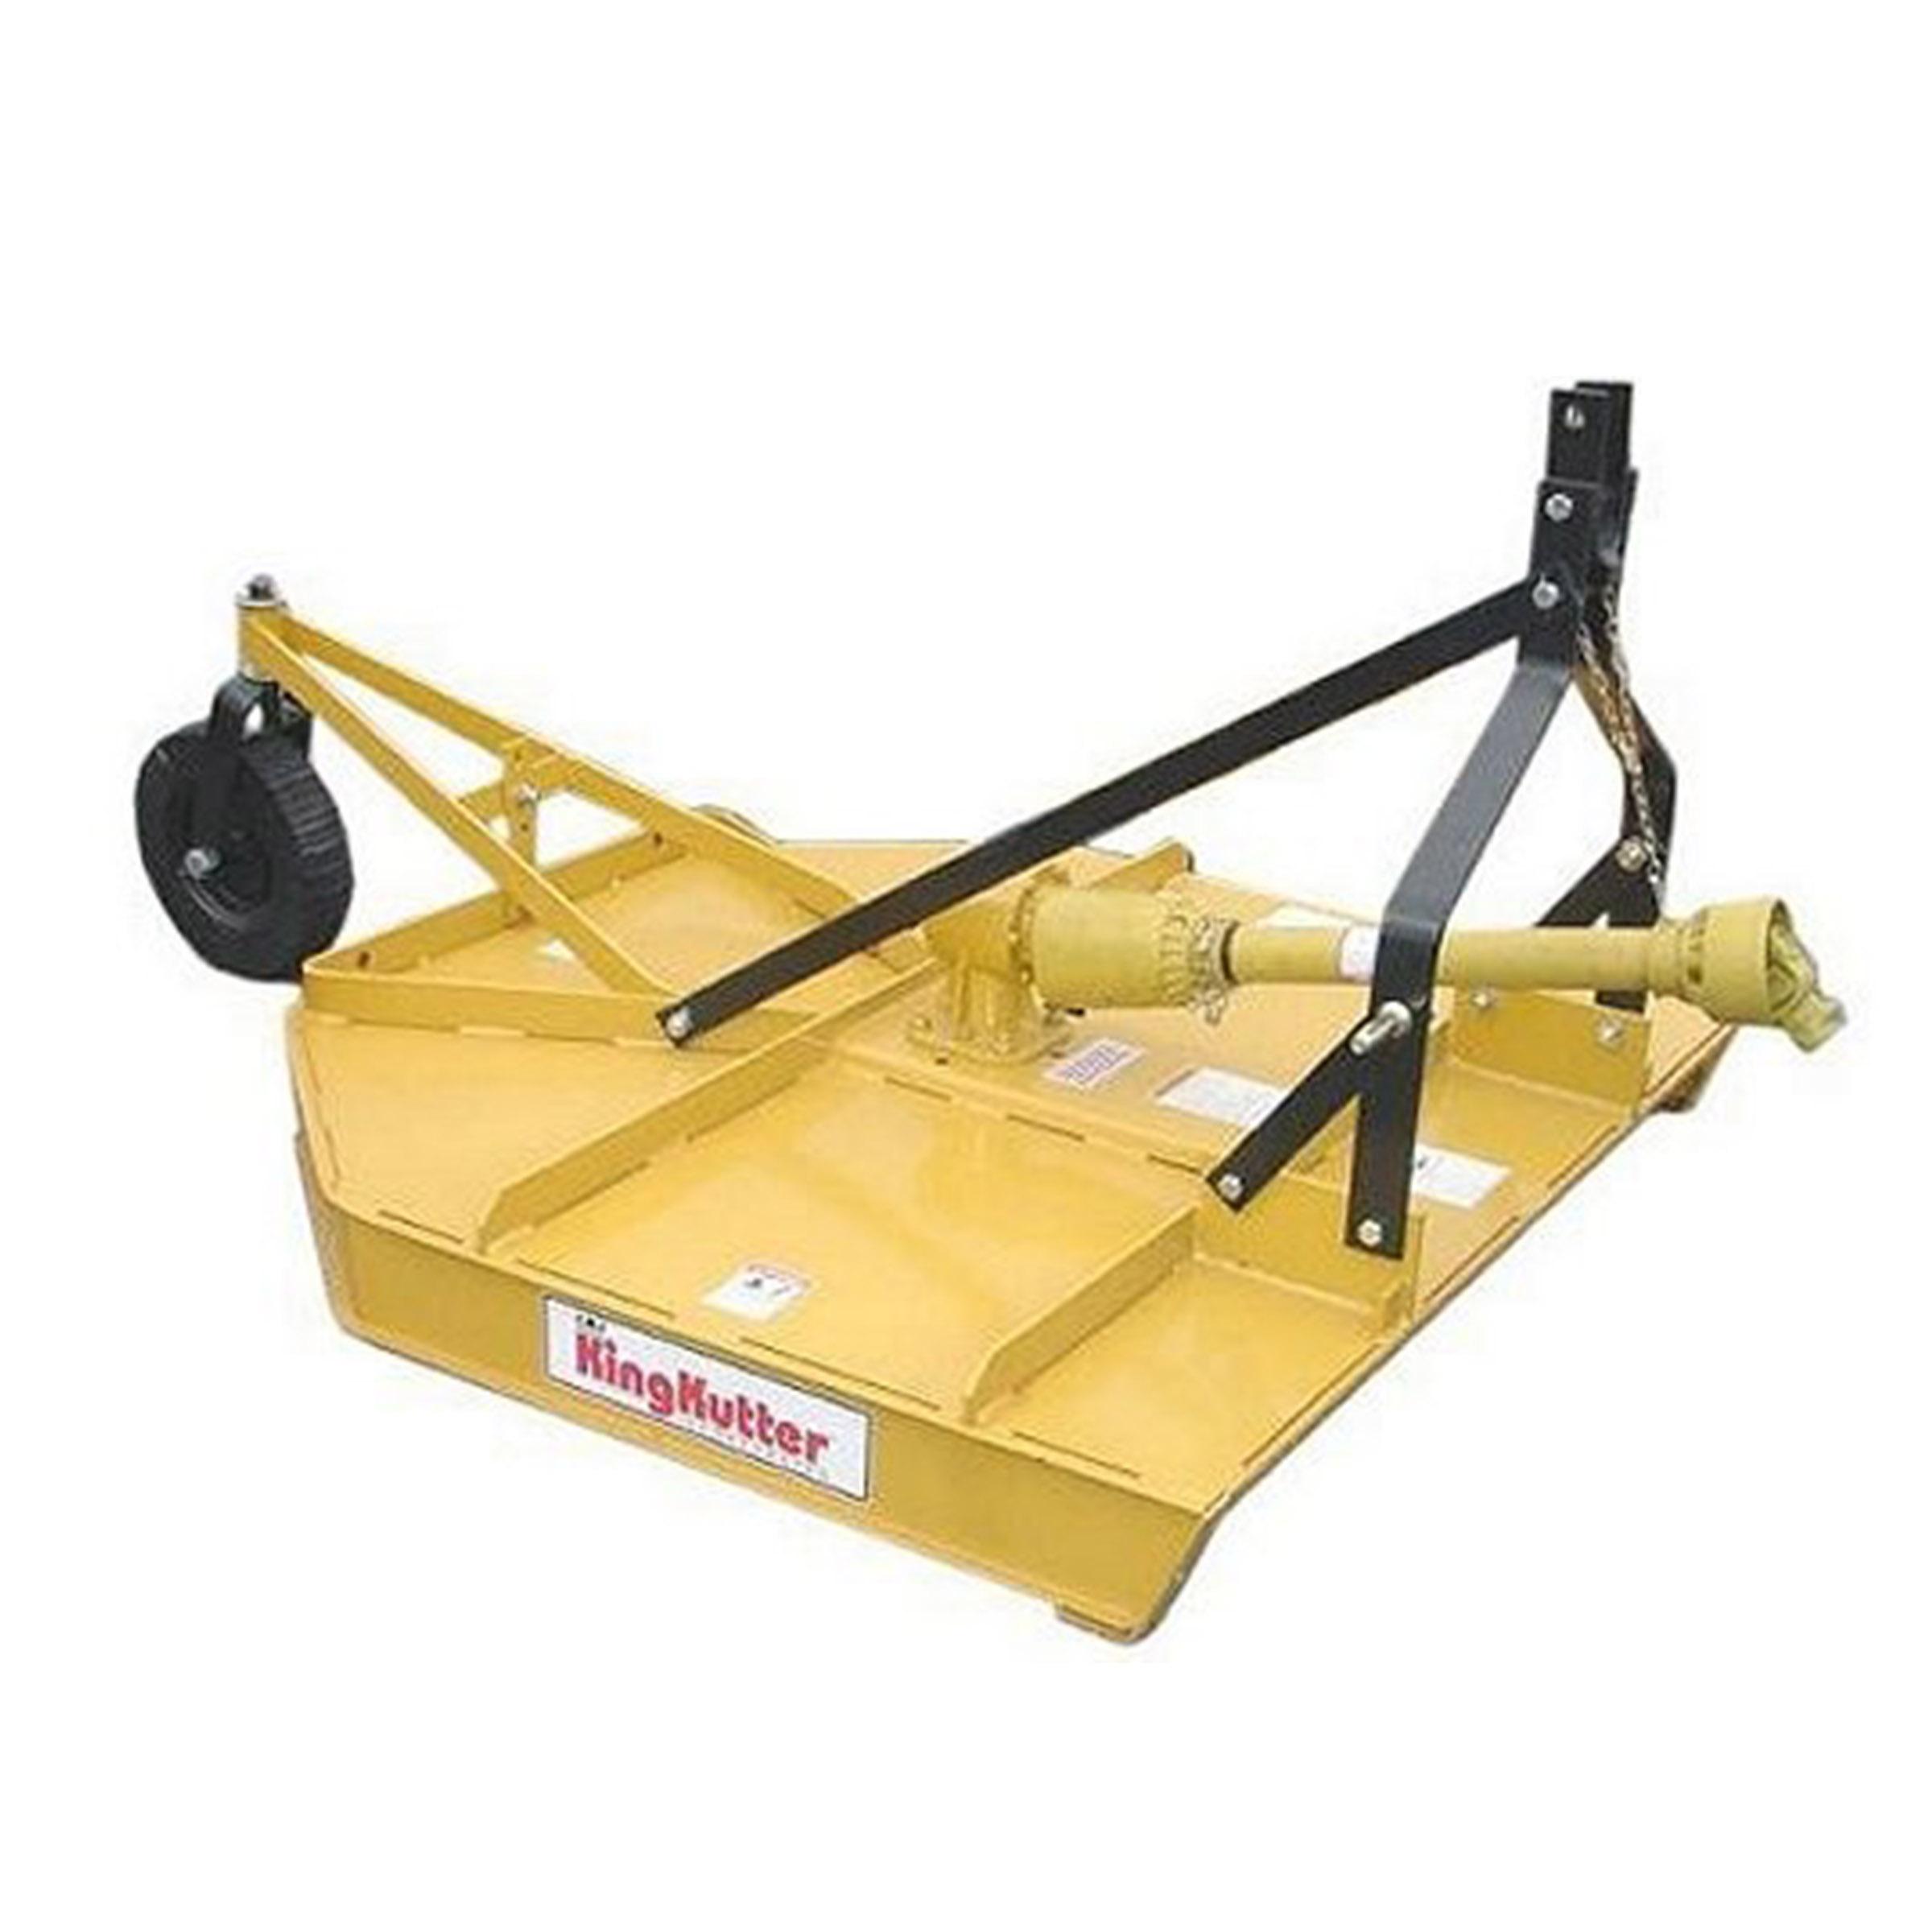 King Kutter 6 Ft Rotary Mower L 72 40 P Yk 939842